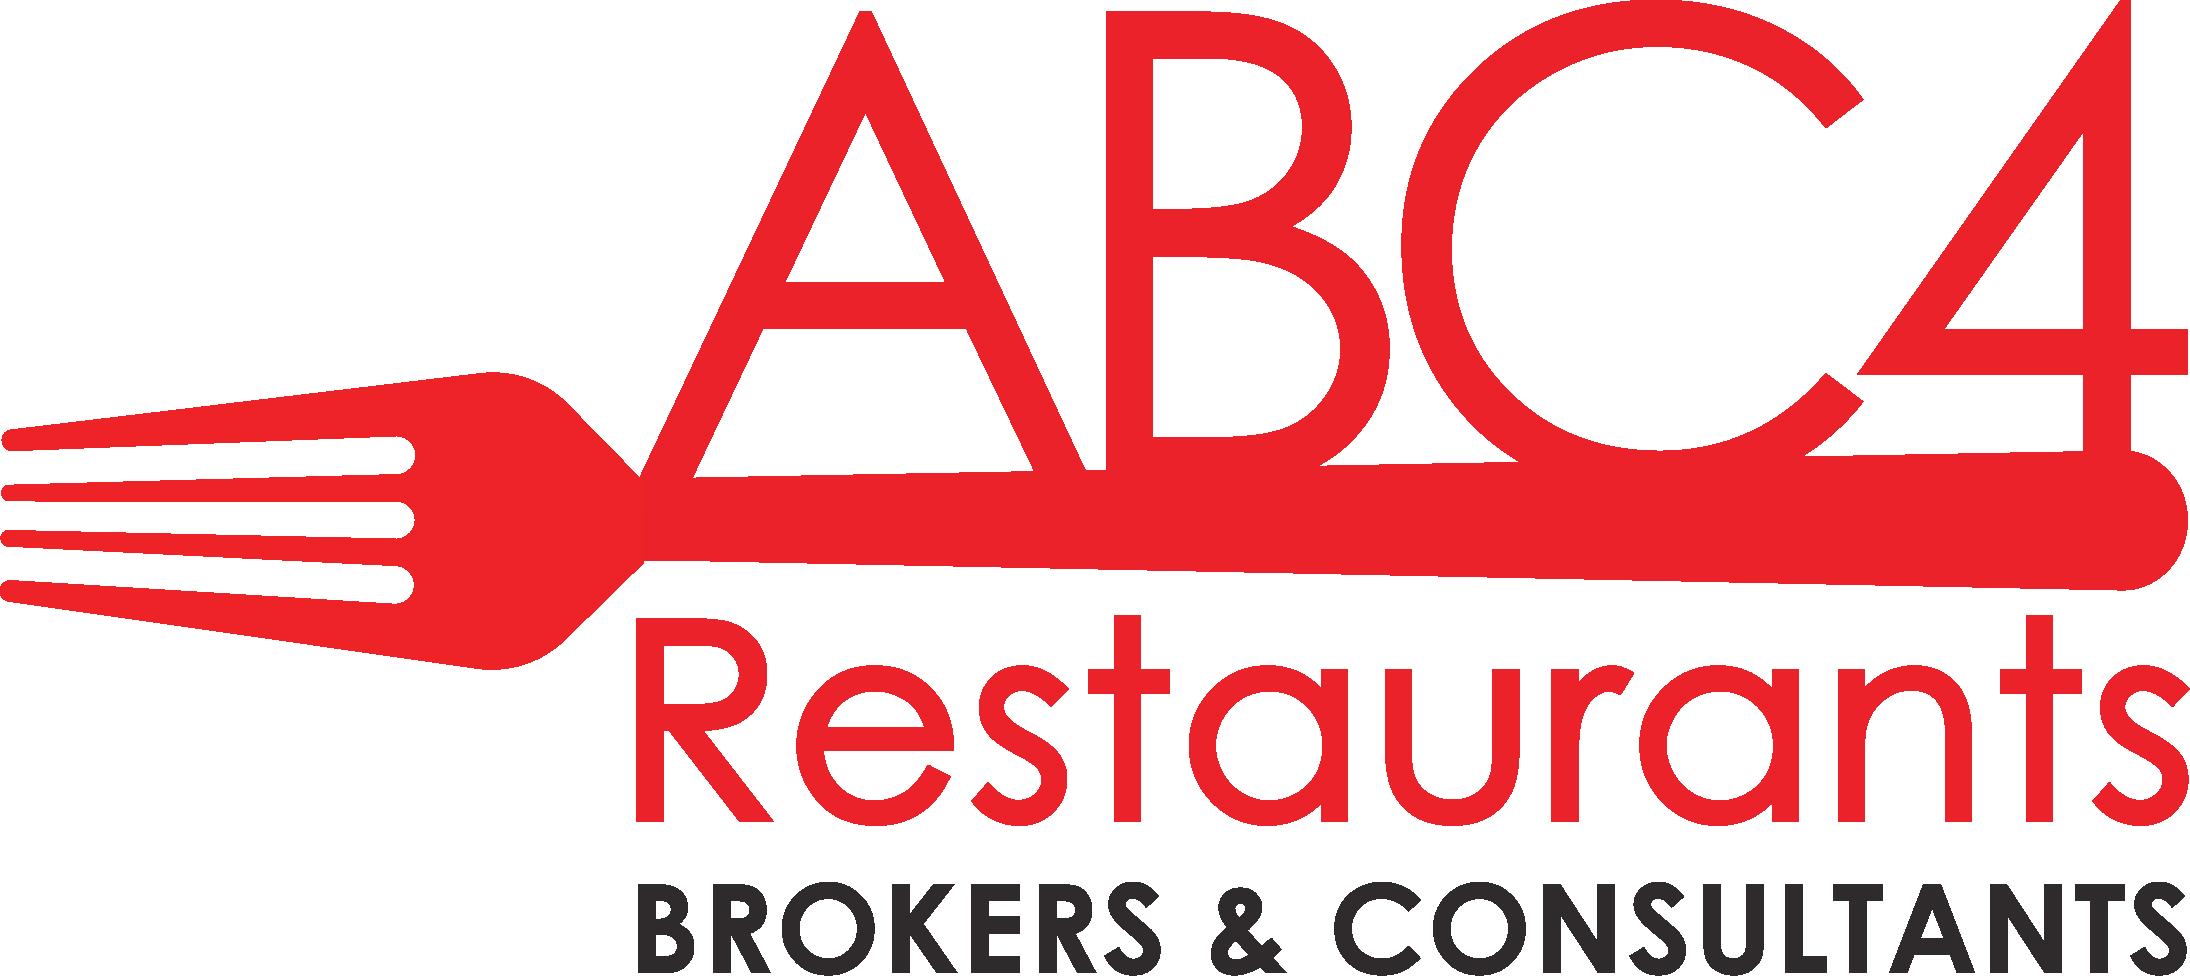 ABC 4 Restaurants Logo